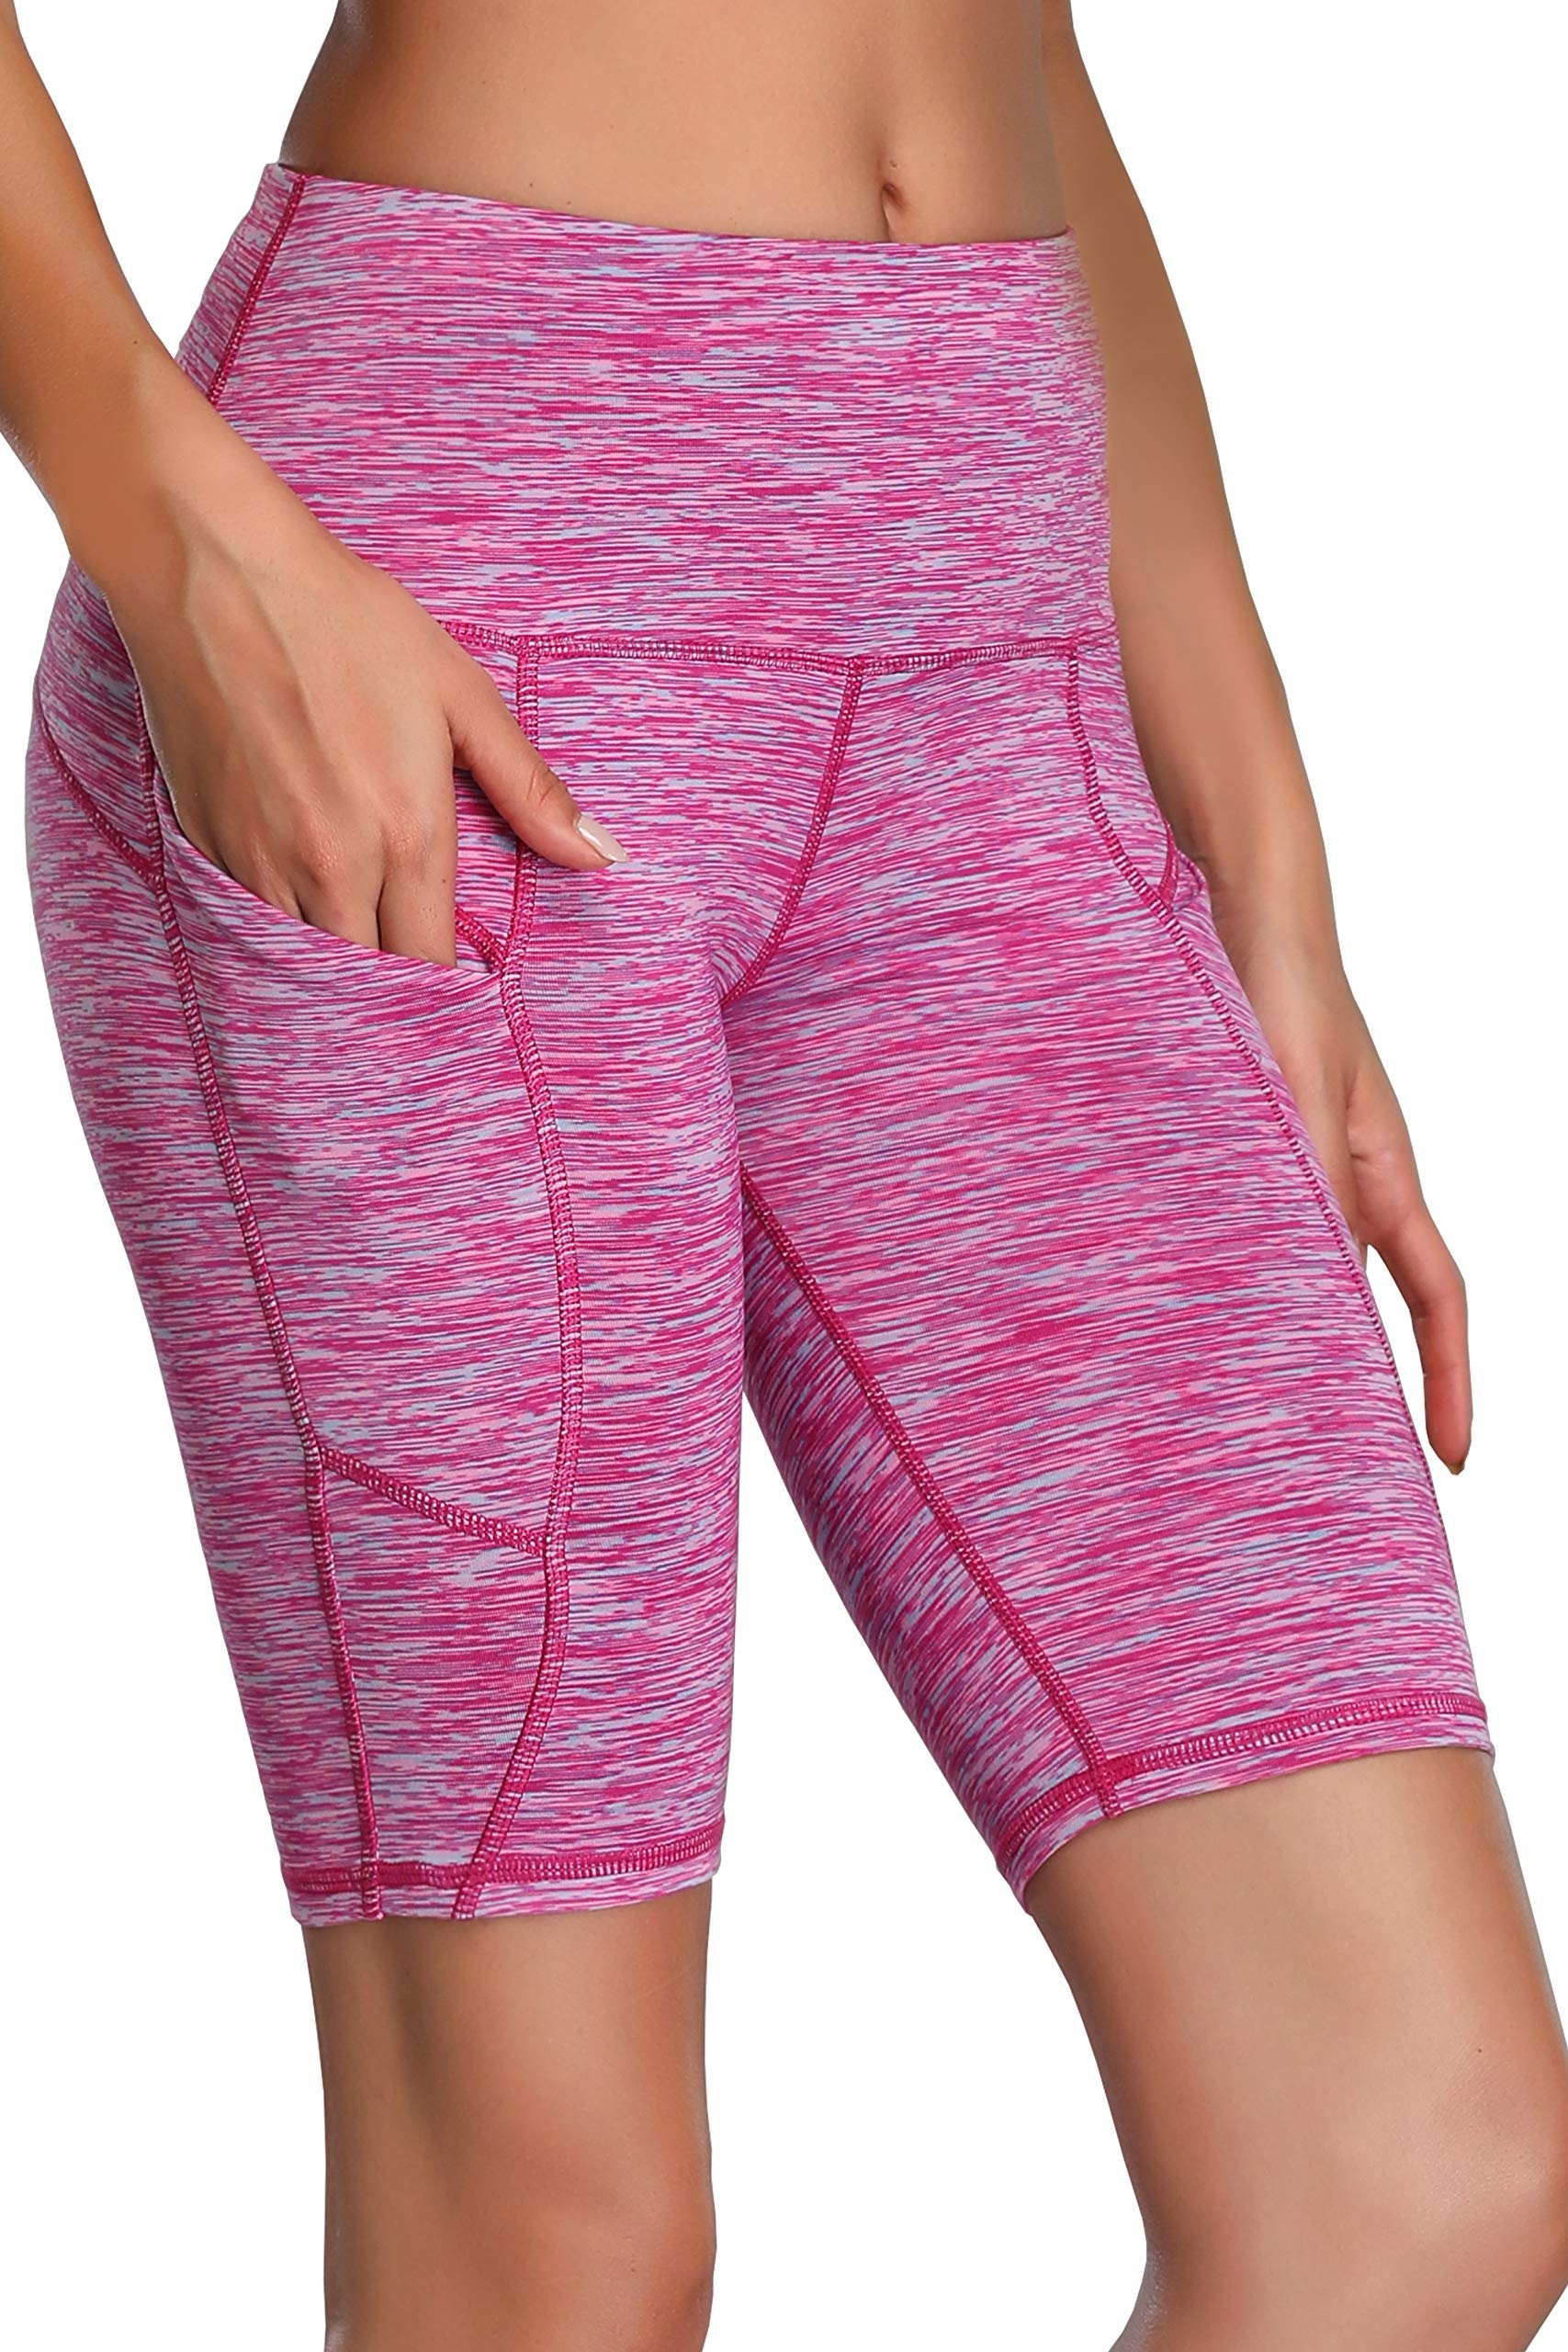 Oalka Women's Yoga Short Side Pockets High Waist Workout Running Shorts Space Dye Camo Pink L by Oalka